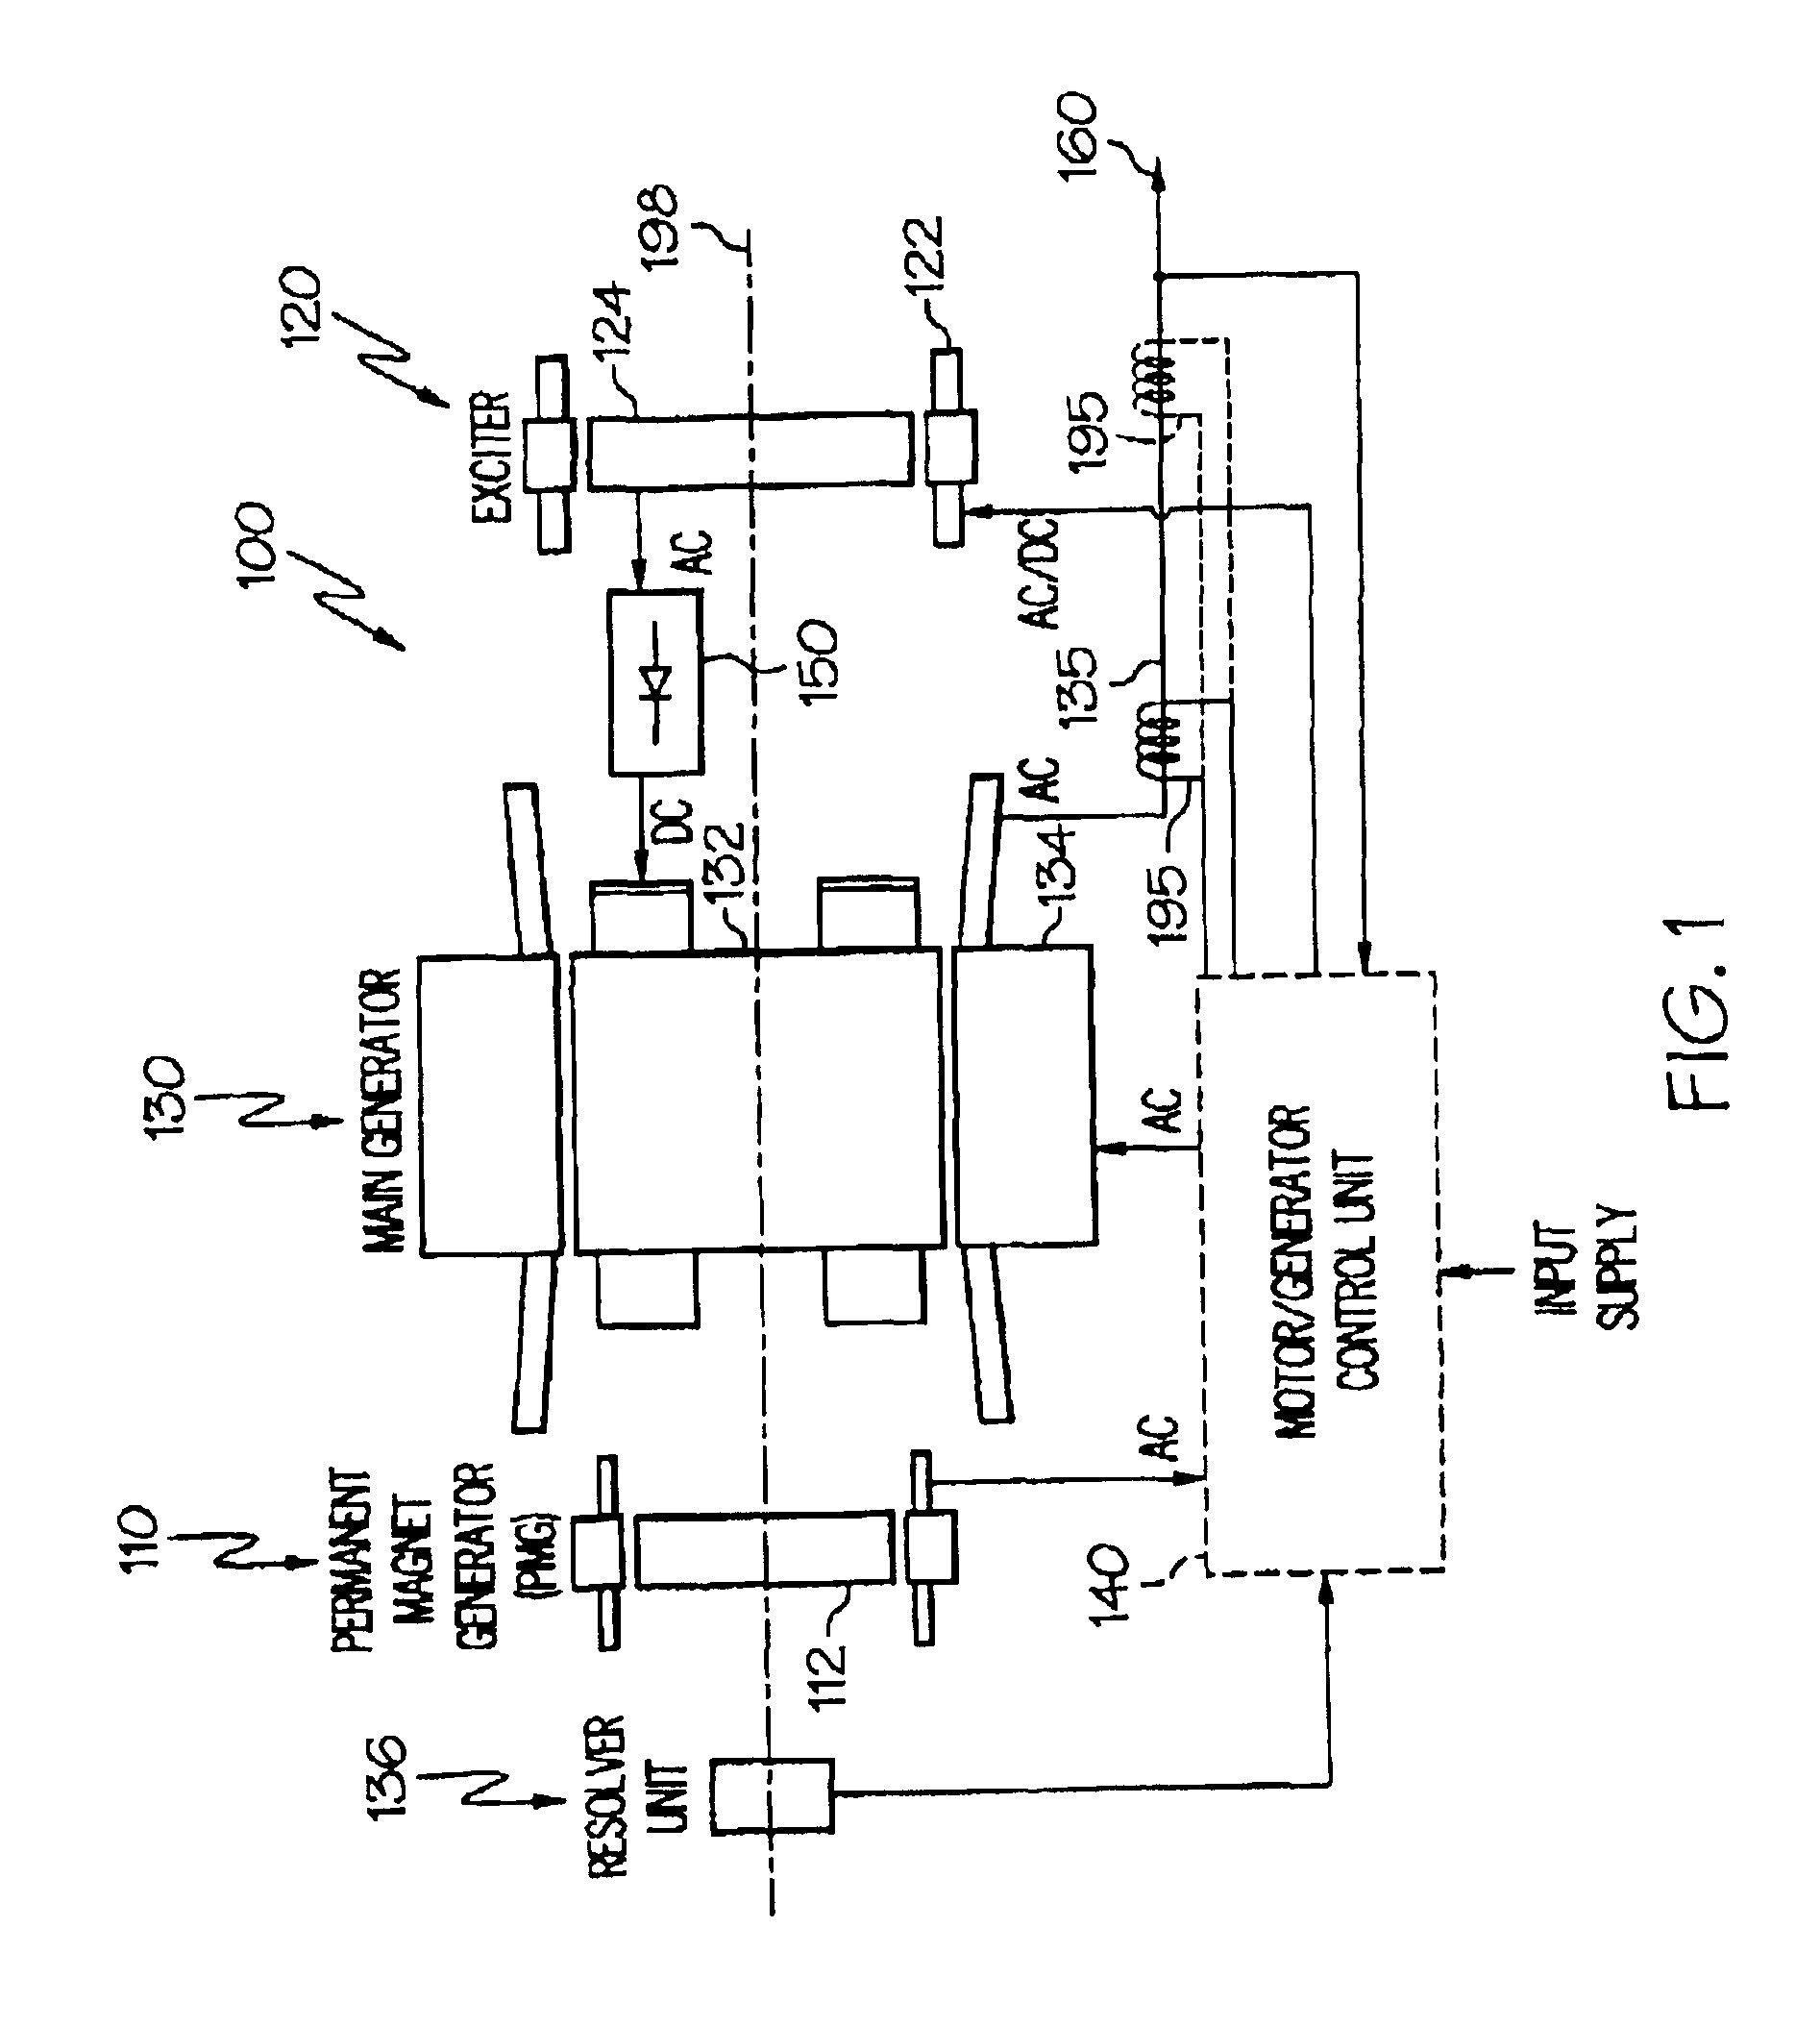 unique wiring diagram starter generator diagram diagramtemplate diagramsample [ 1894 x 2108 Pixel ]